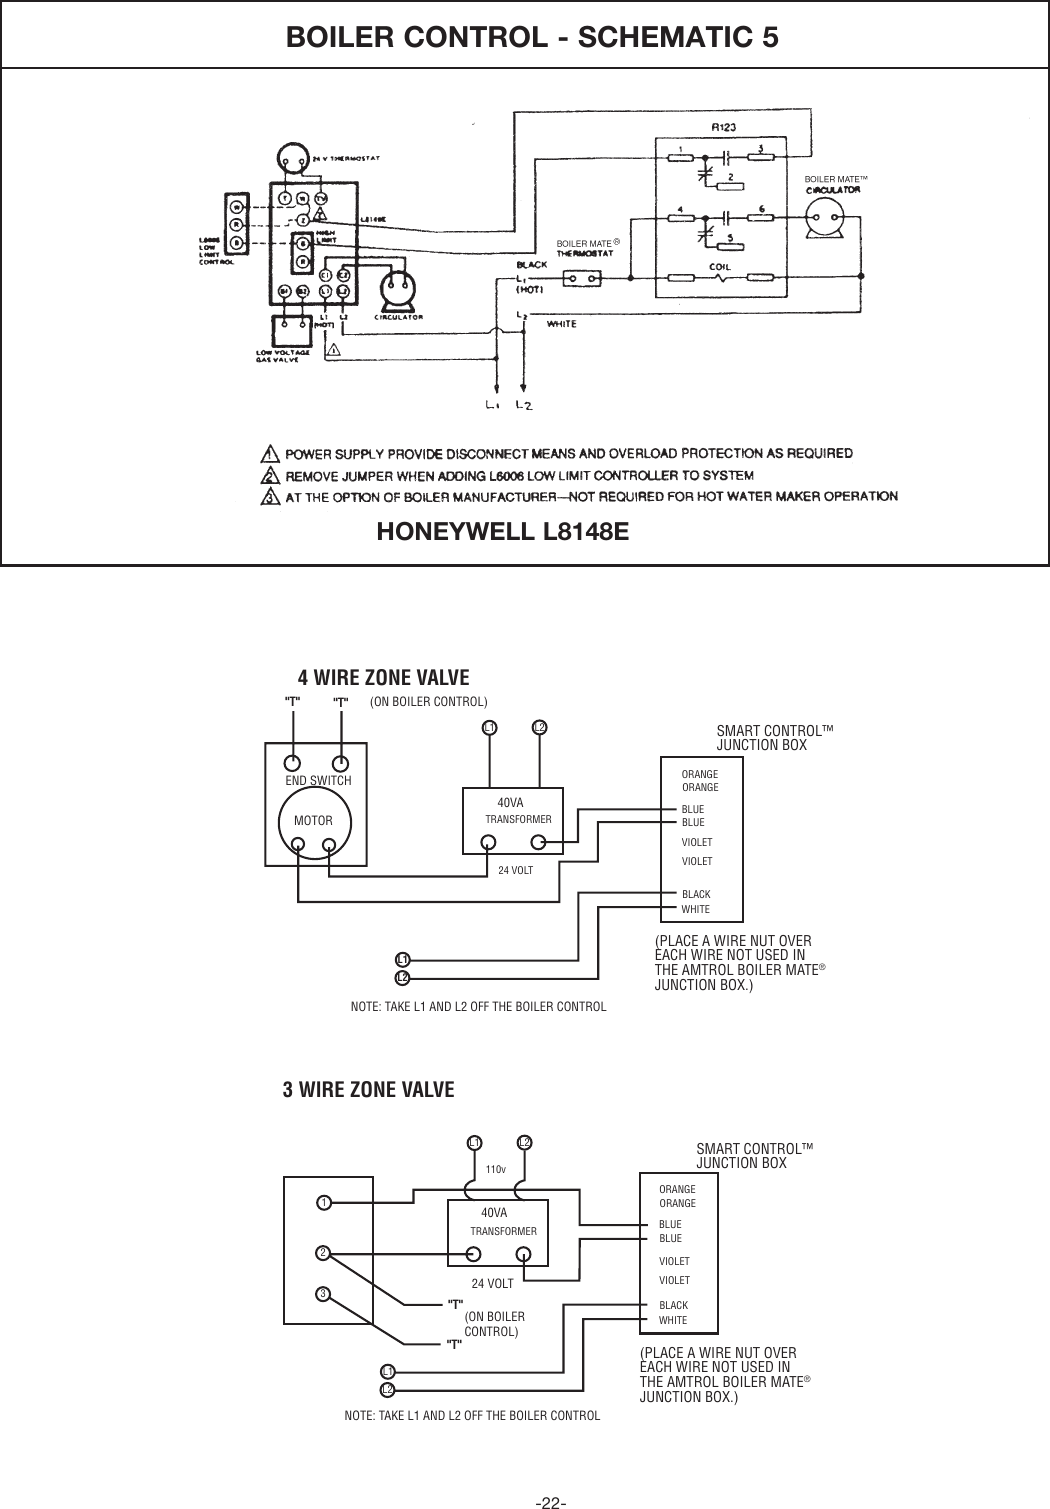 Amtrol Boilermate Rtr Installation Manual 9040 586 07_08